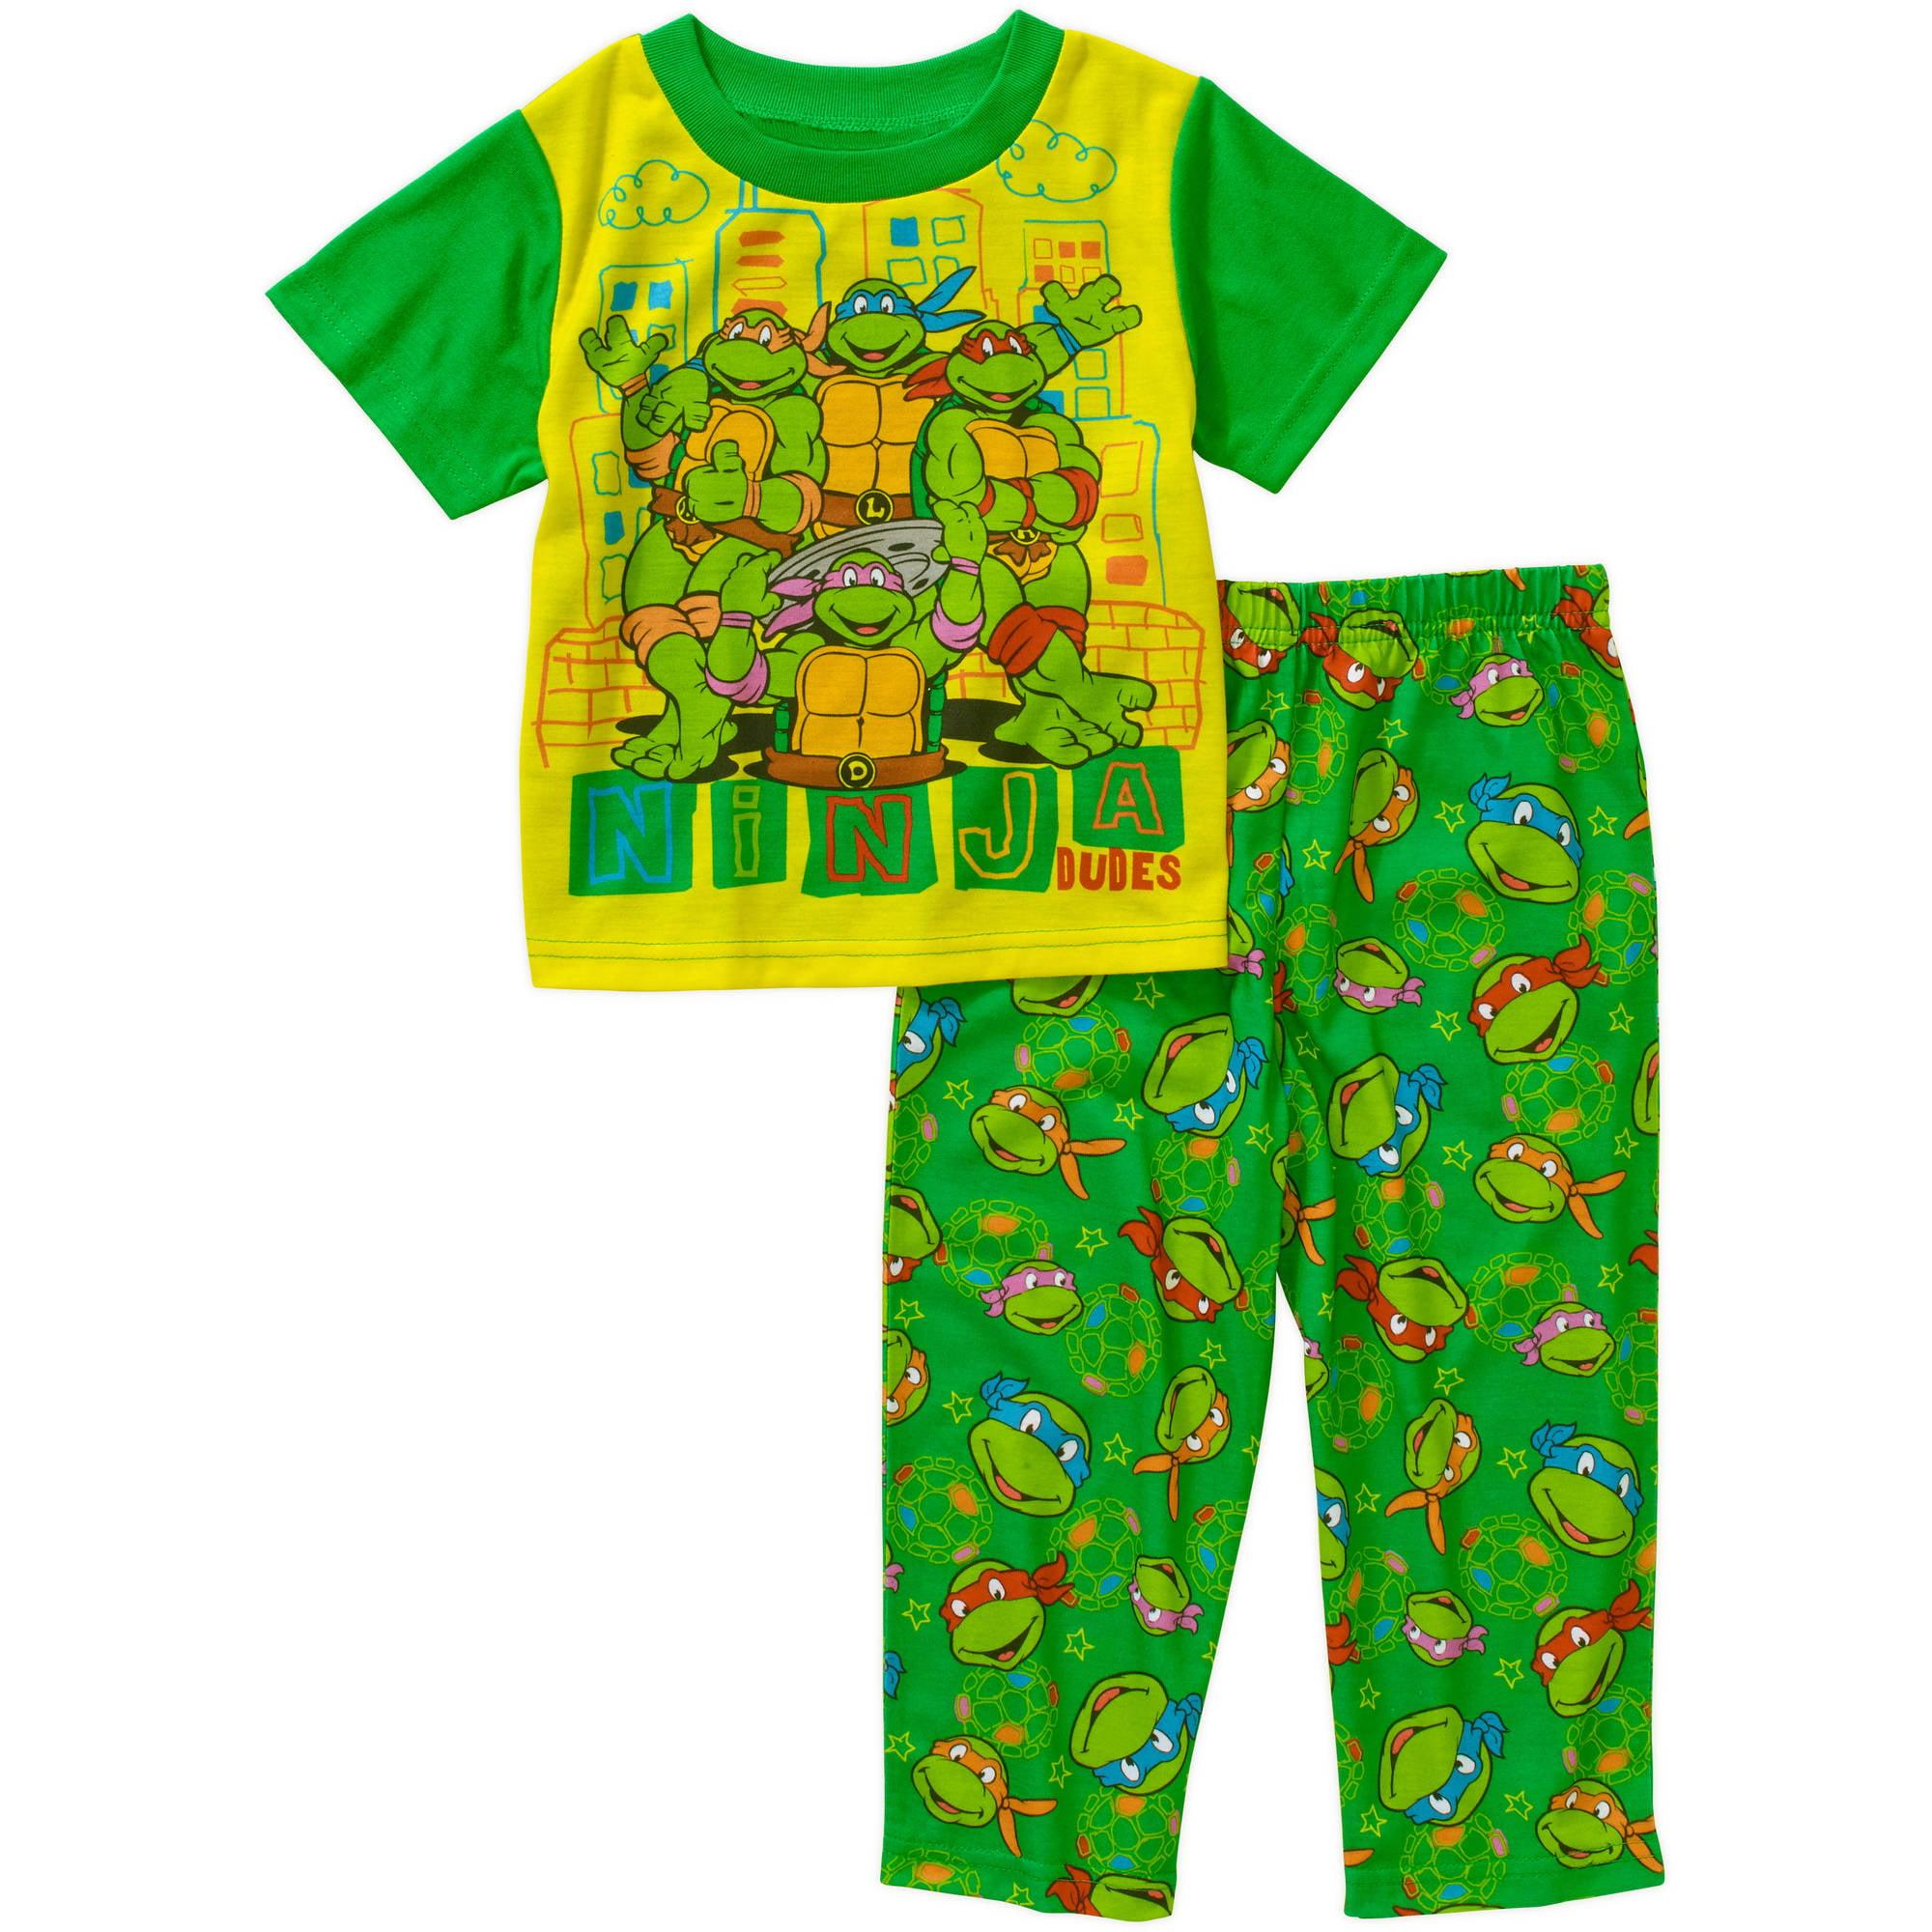 Teenage Mutant Ninja Turtles Toddler Boy Short Sleeve Pajama Sleepwear Set